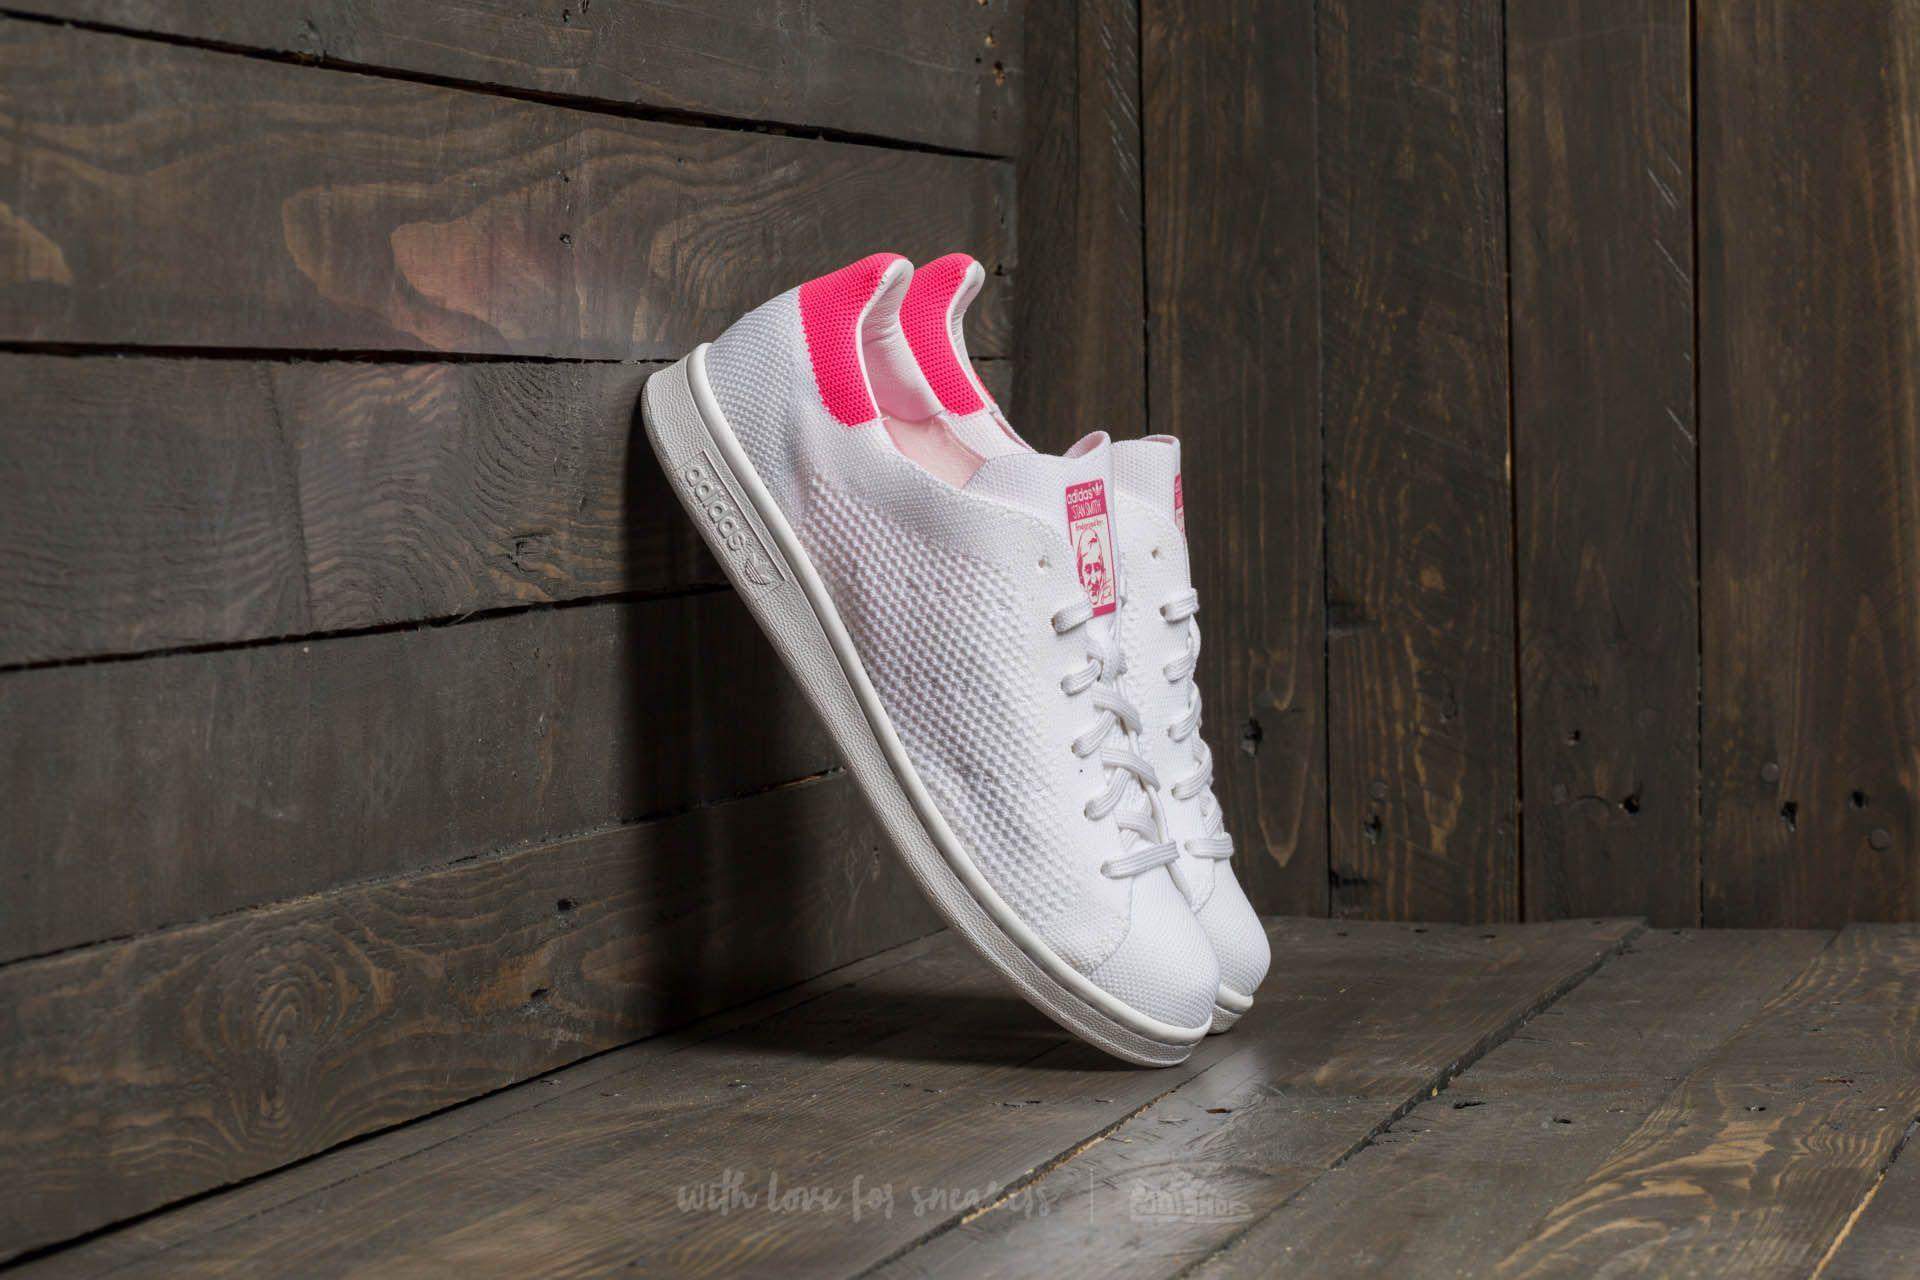 Lyst adidas Originals Adidas Stan Smith primeknit FTW blanco / ultra Pop